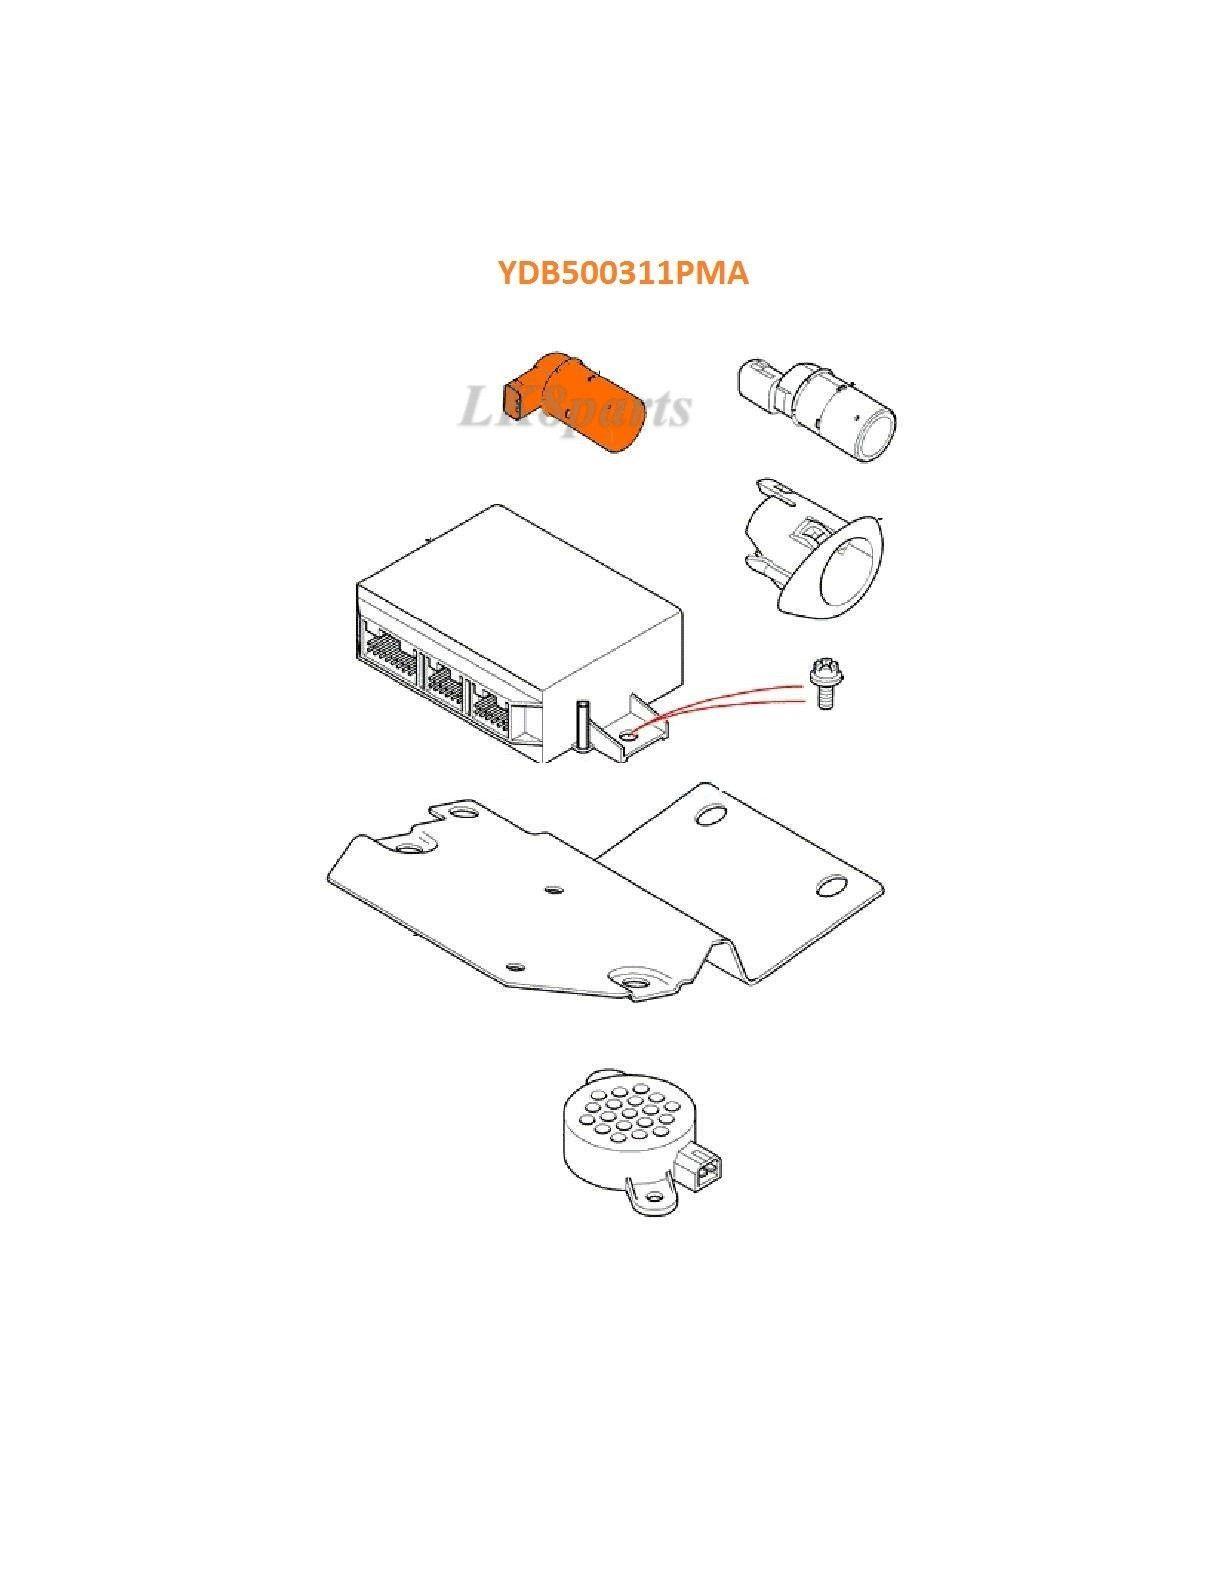 Land rover lr3 freelander parking aid distance system sensor ydb500311pma new